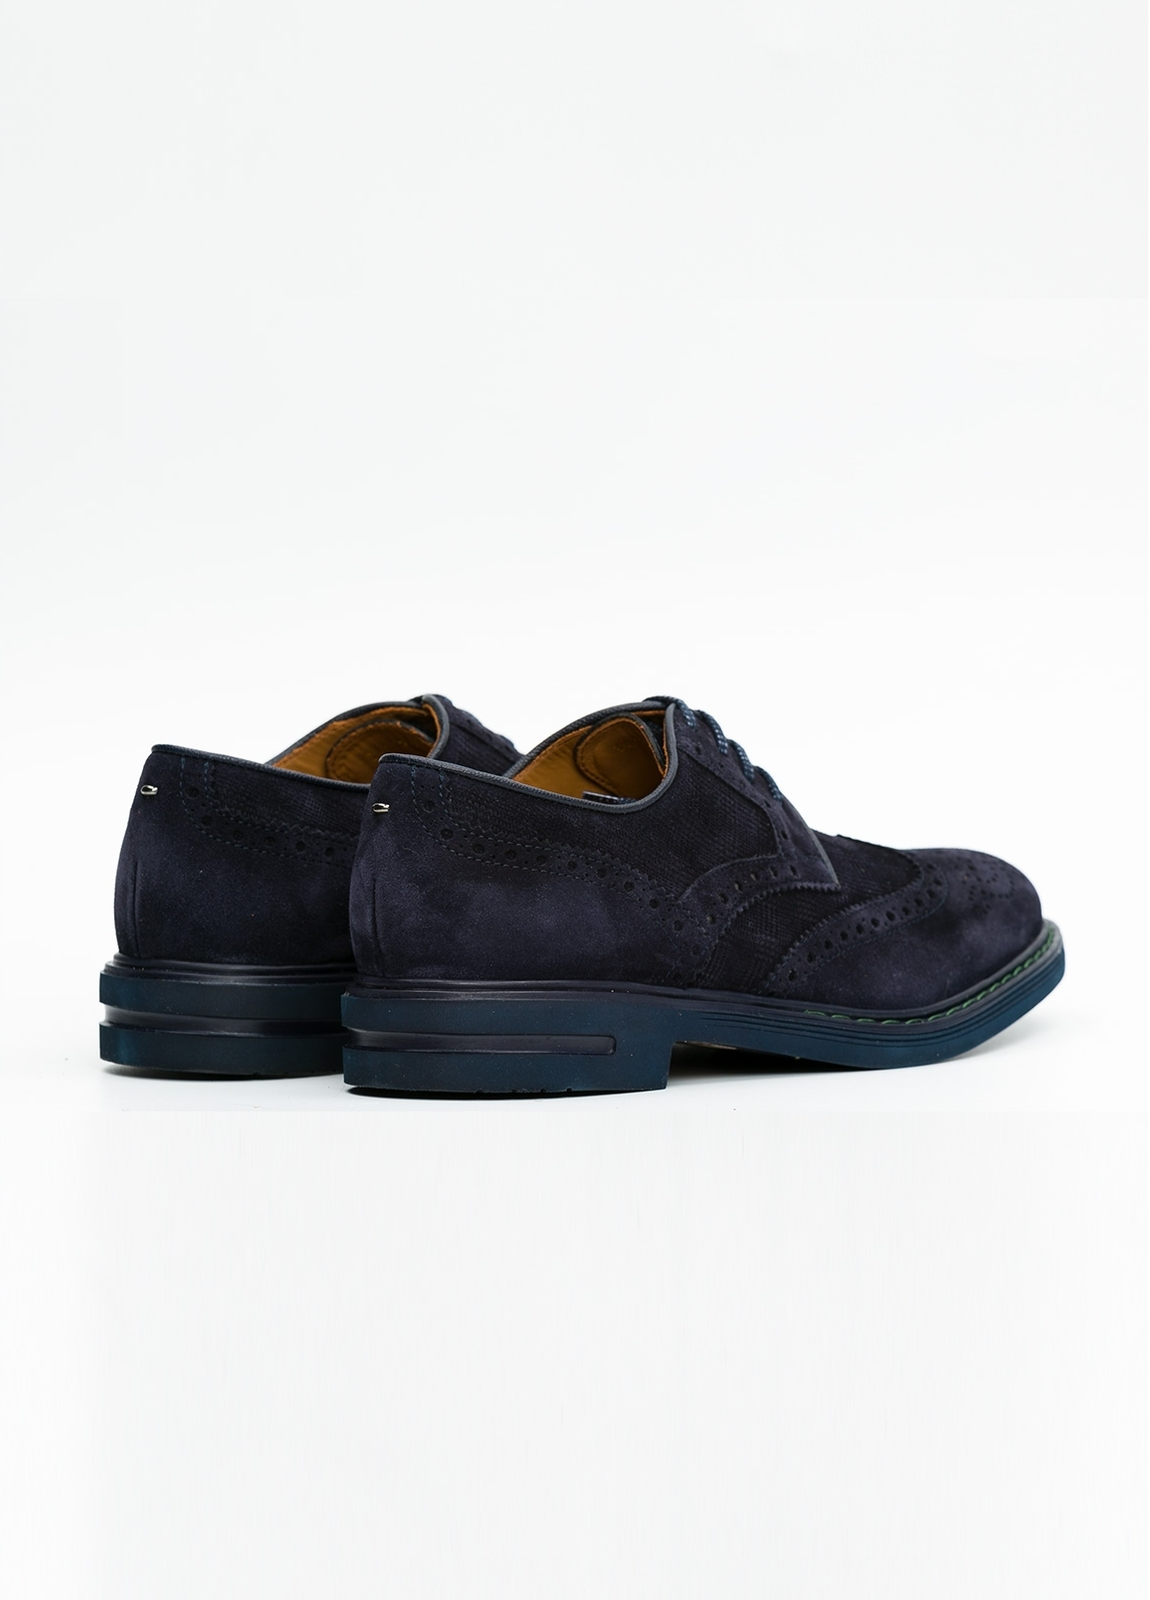 Zapato Formal Wear color azul marino. 100% Serraje. - Ítem4